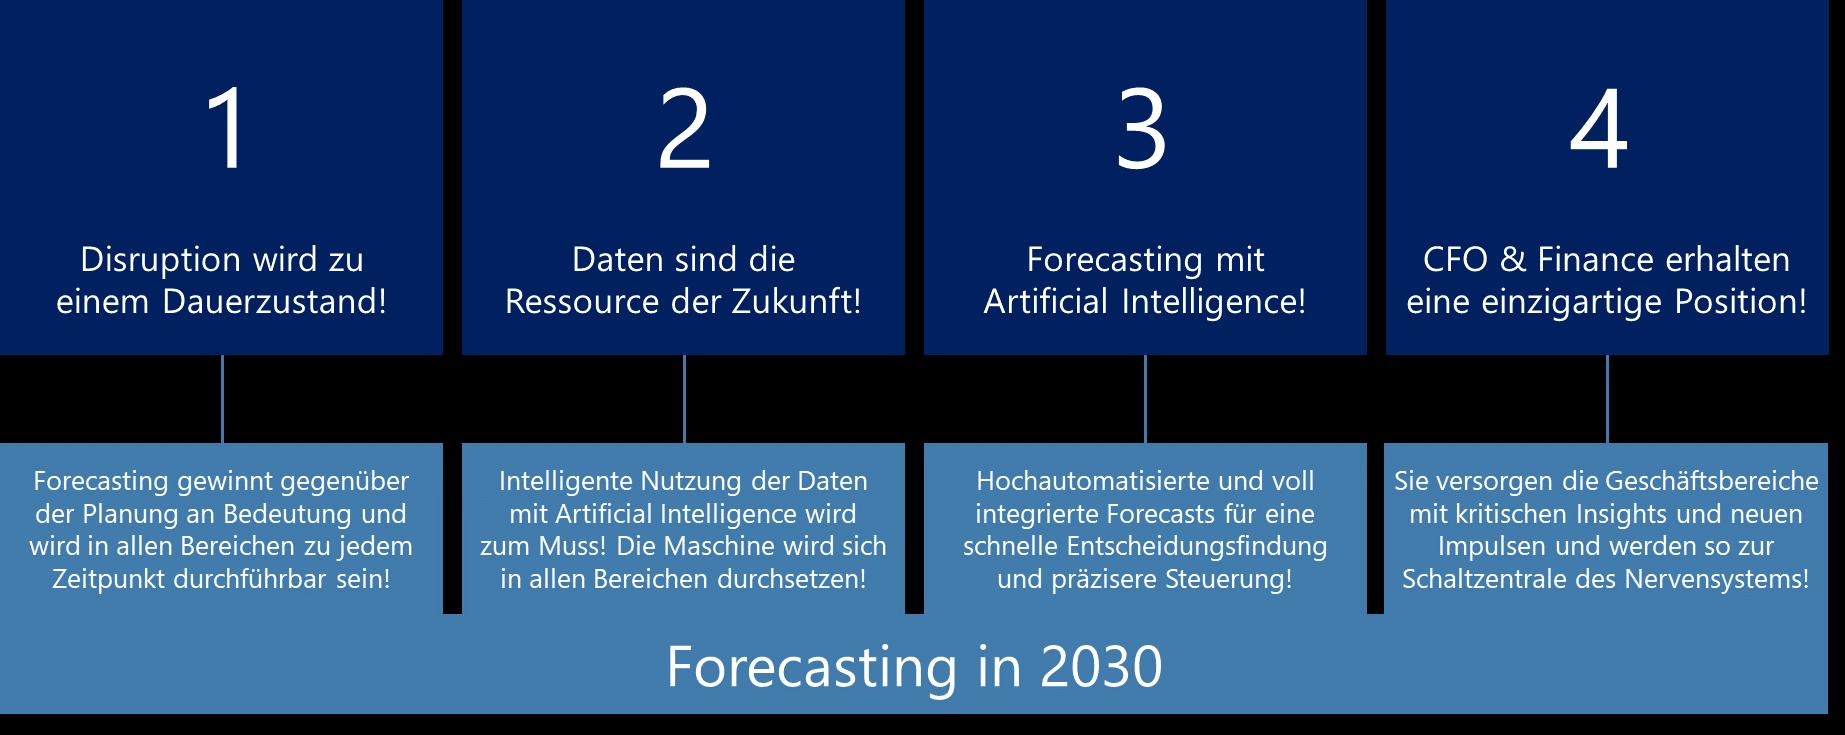 Forecasting 2030 Trends